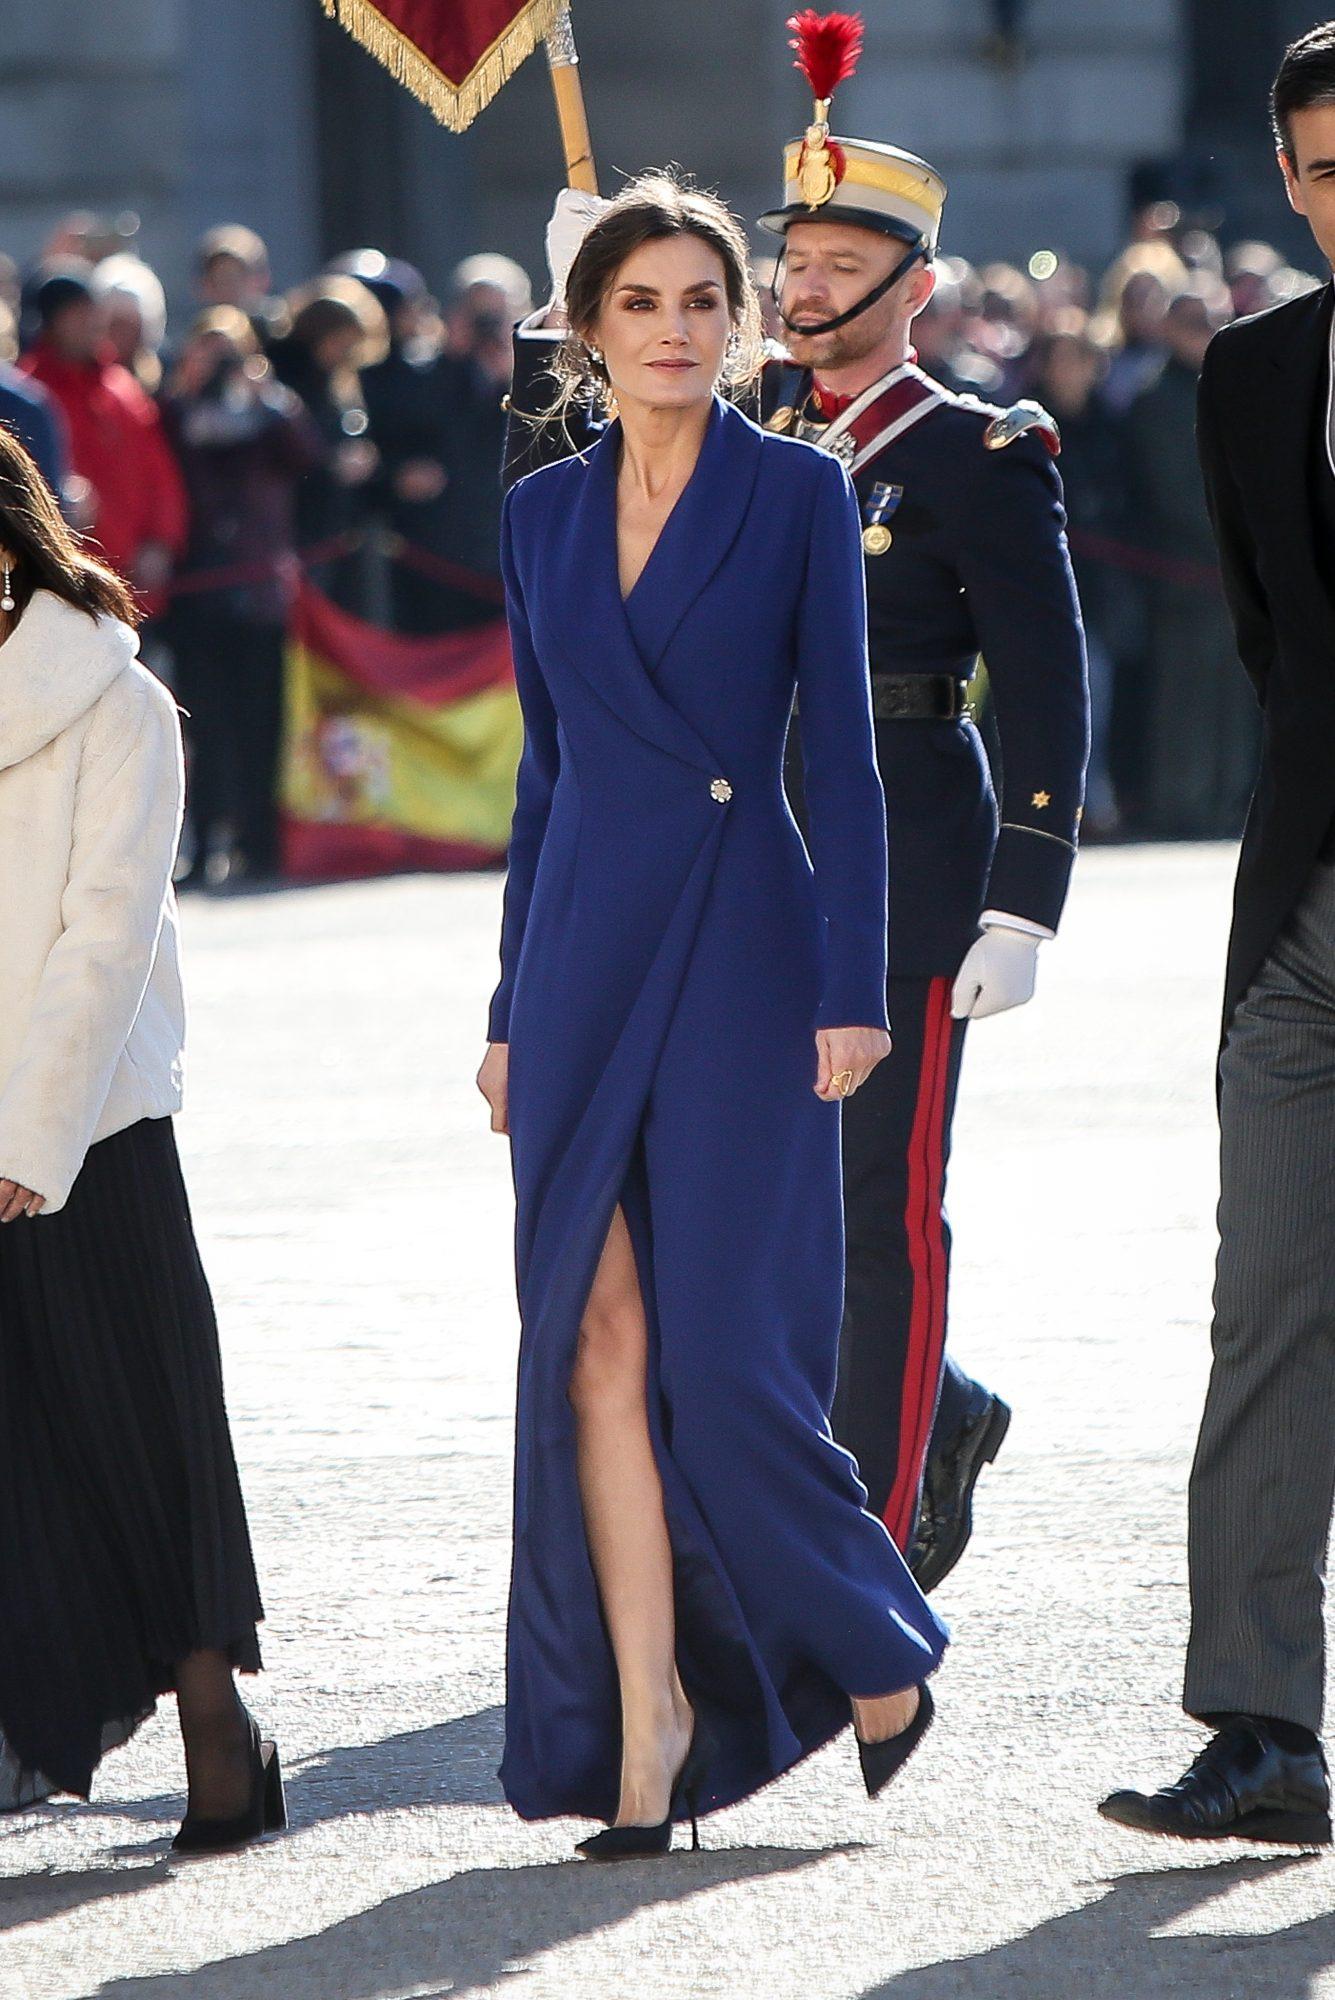 Reina Letizia, estilo, vestido azul, pascua militar